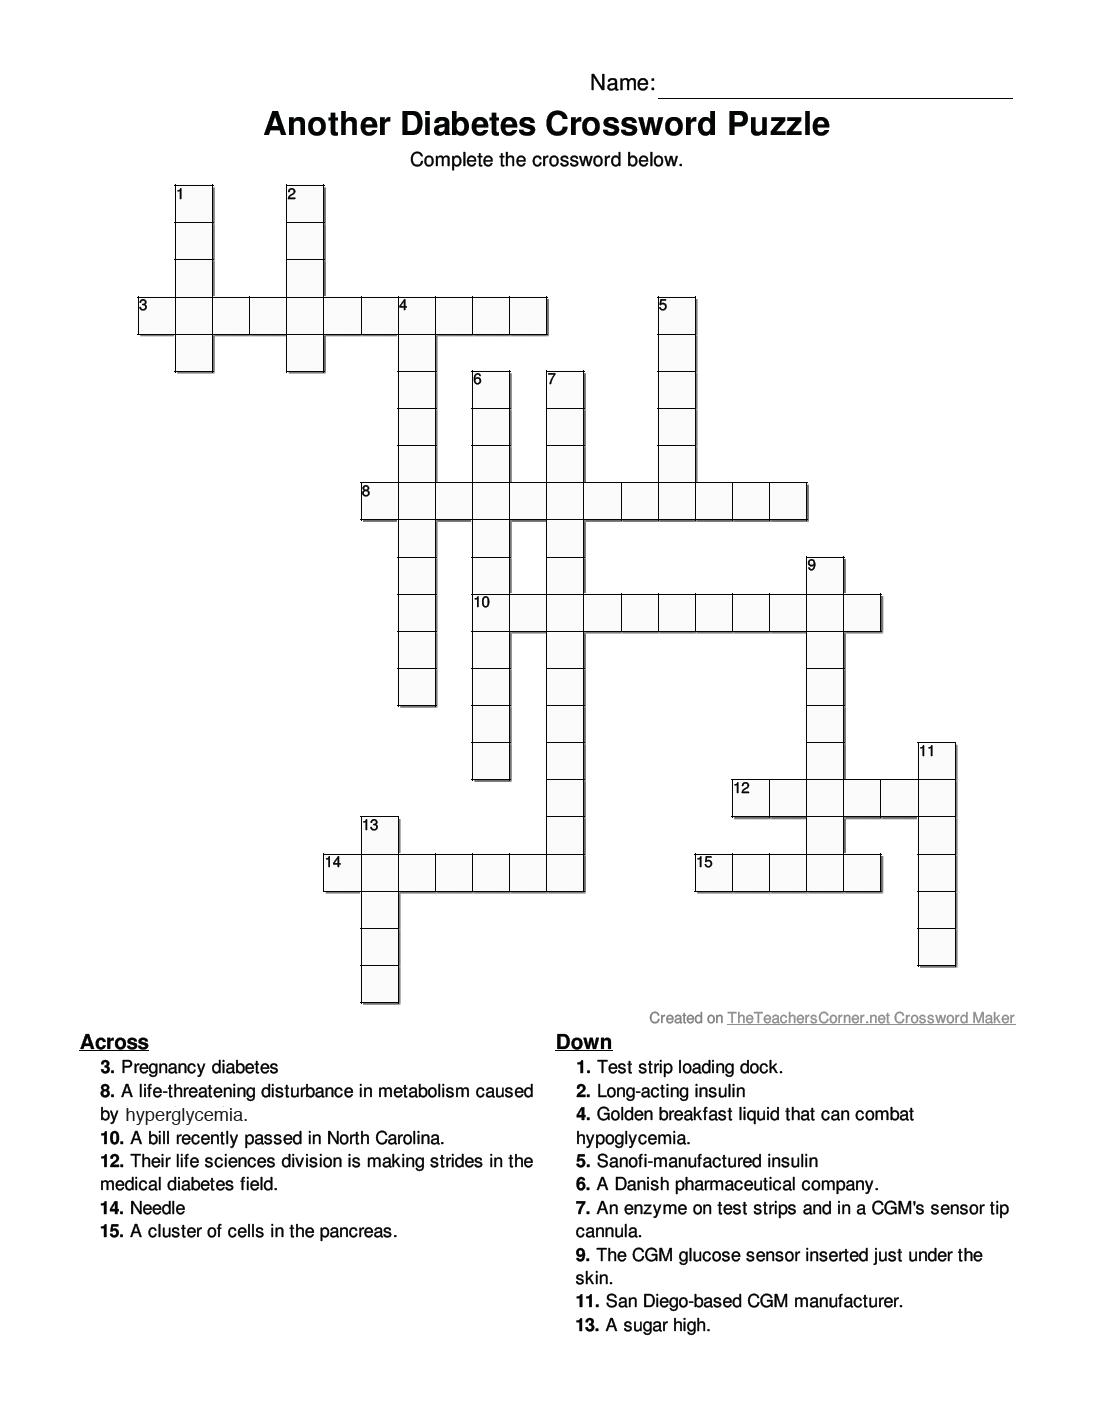 Insulin Nationanother Diabetes Crossword Puzzle